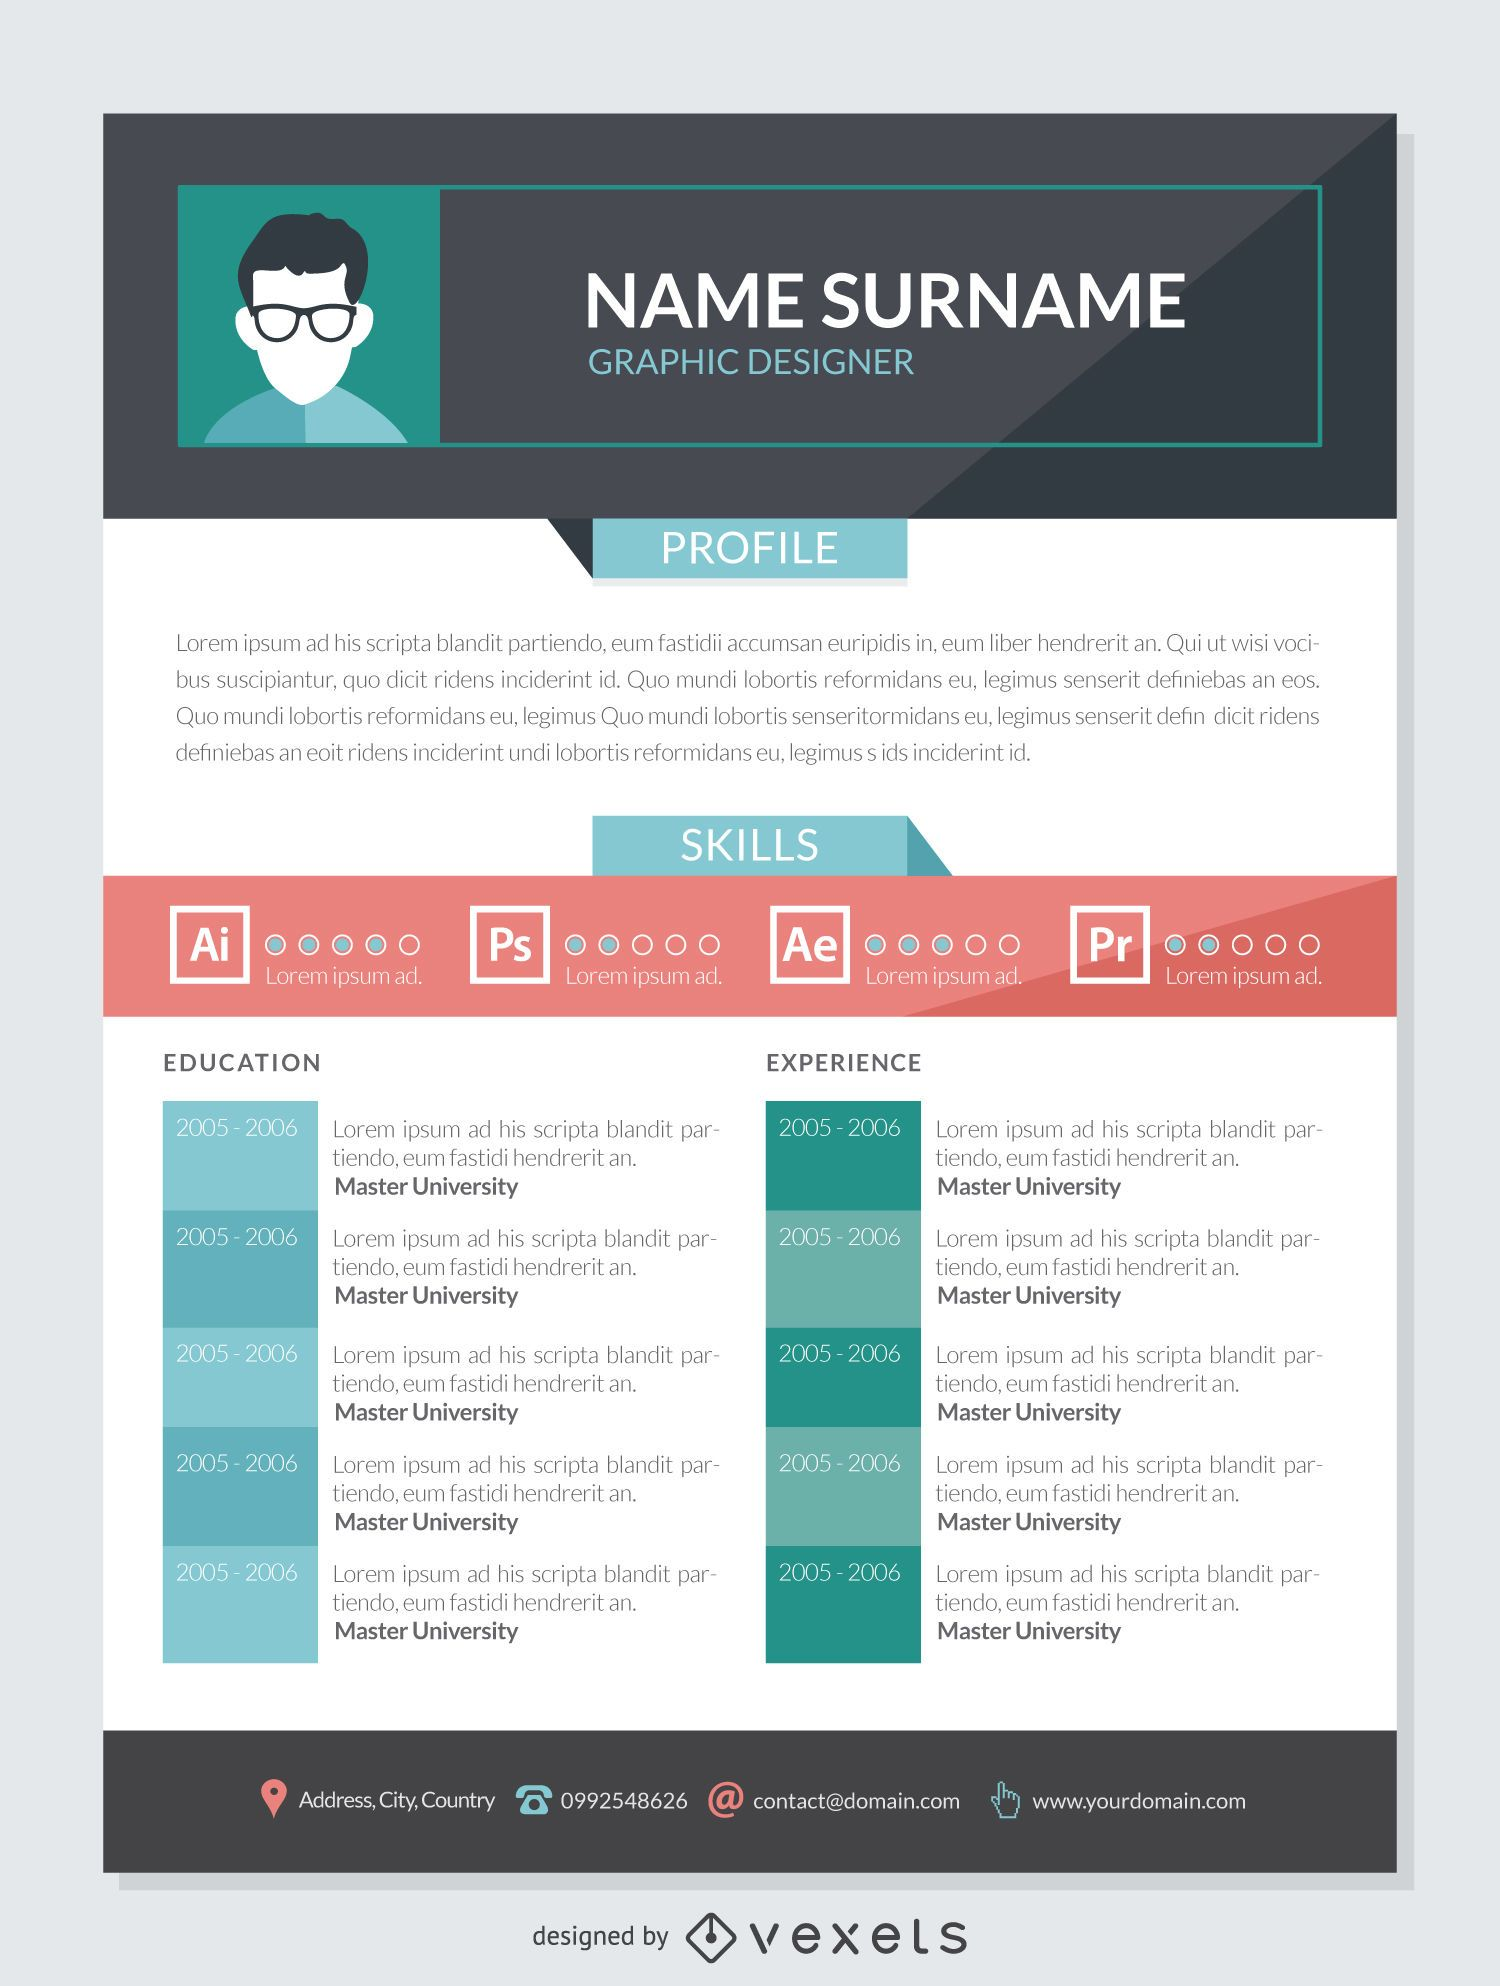 Graphic Designer CV Mockup Template Vector Download